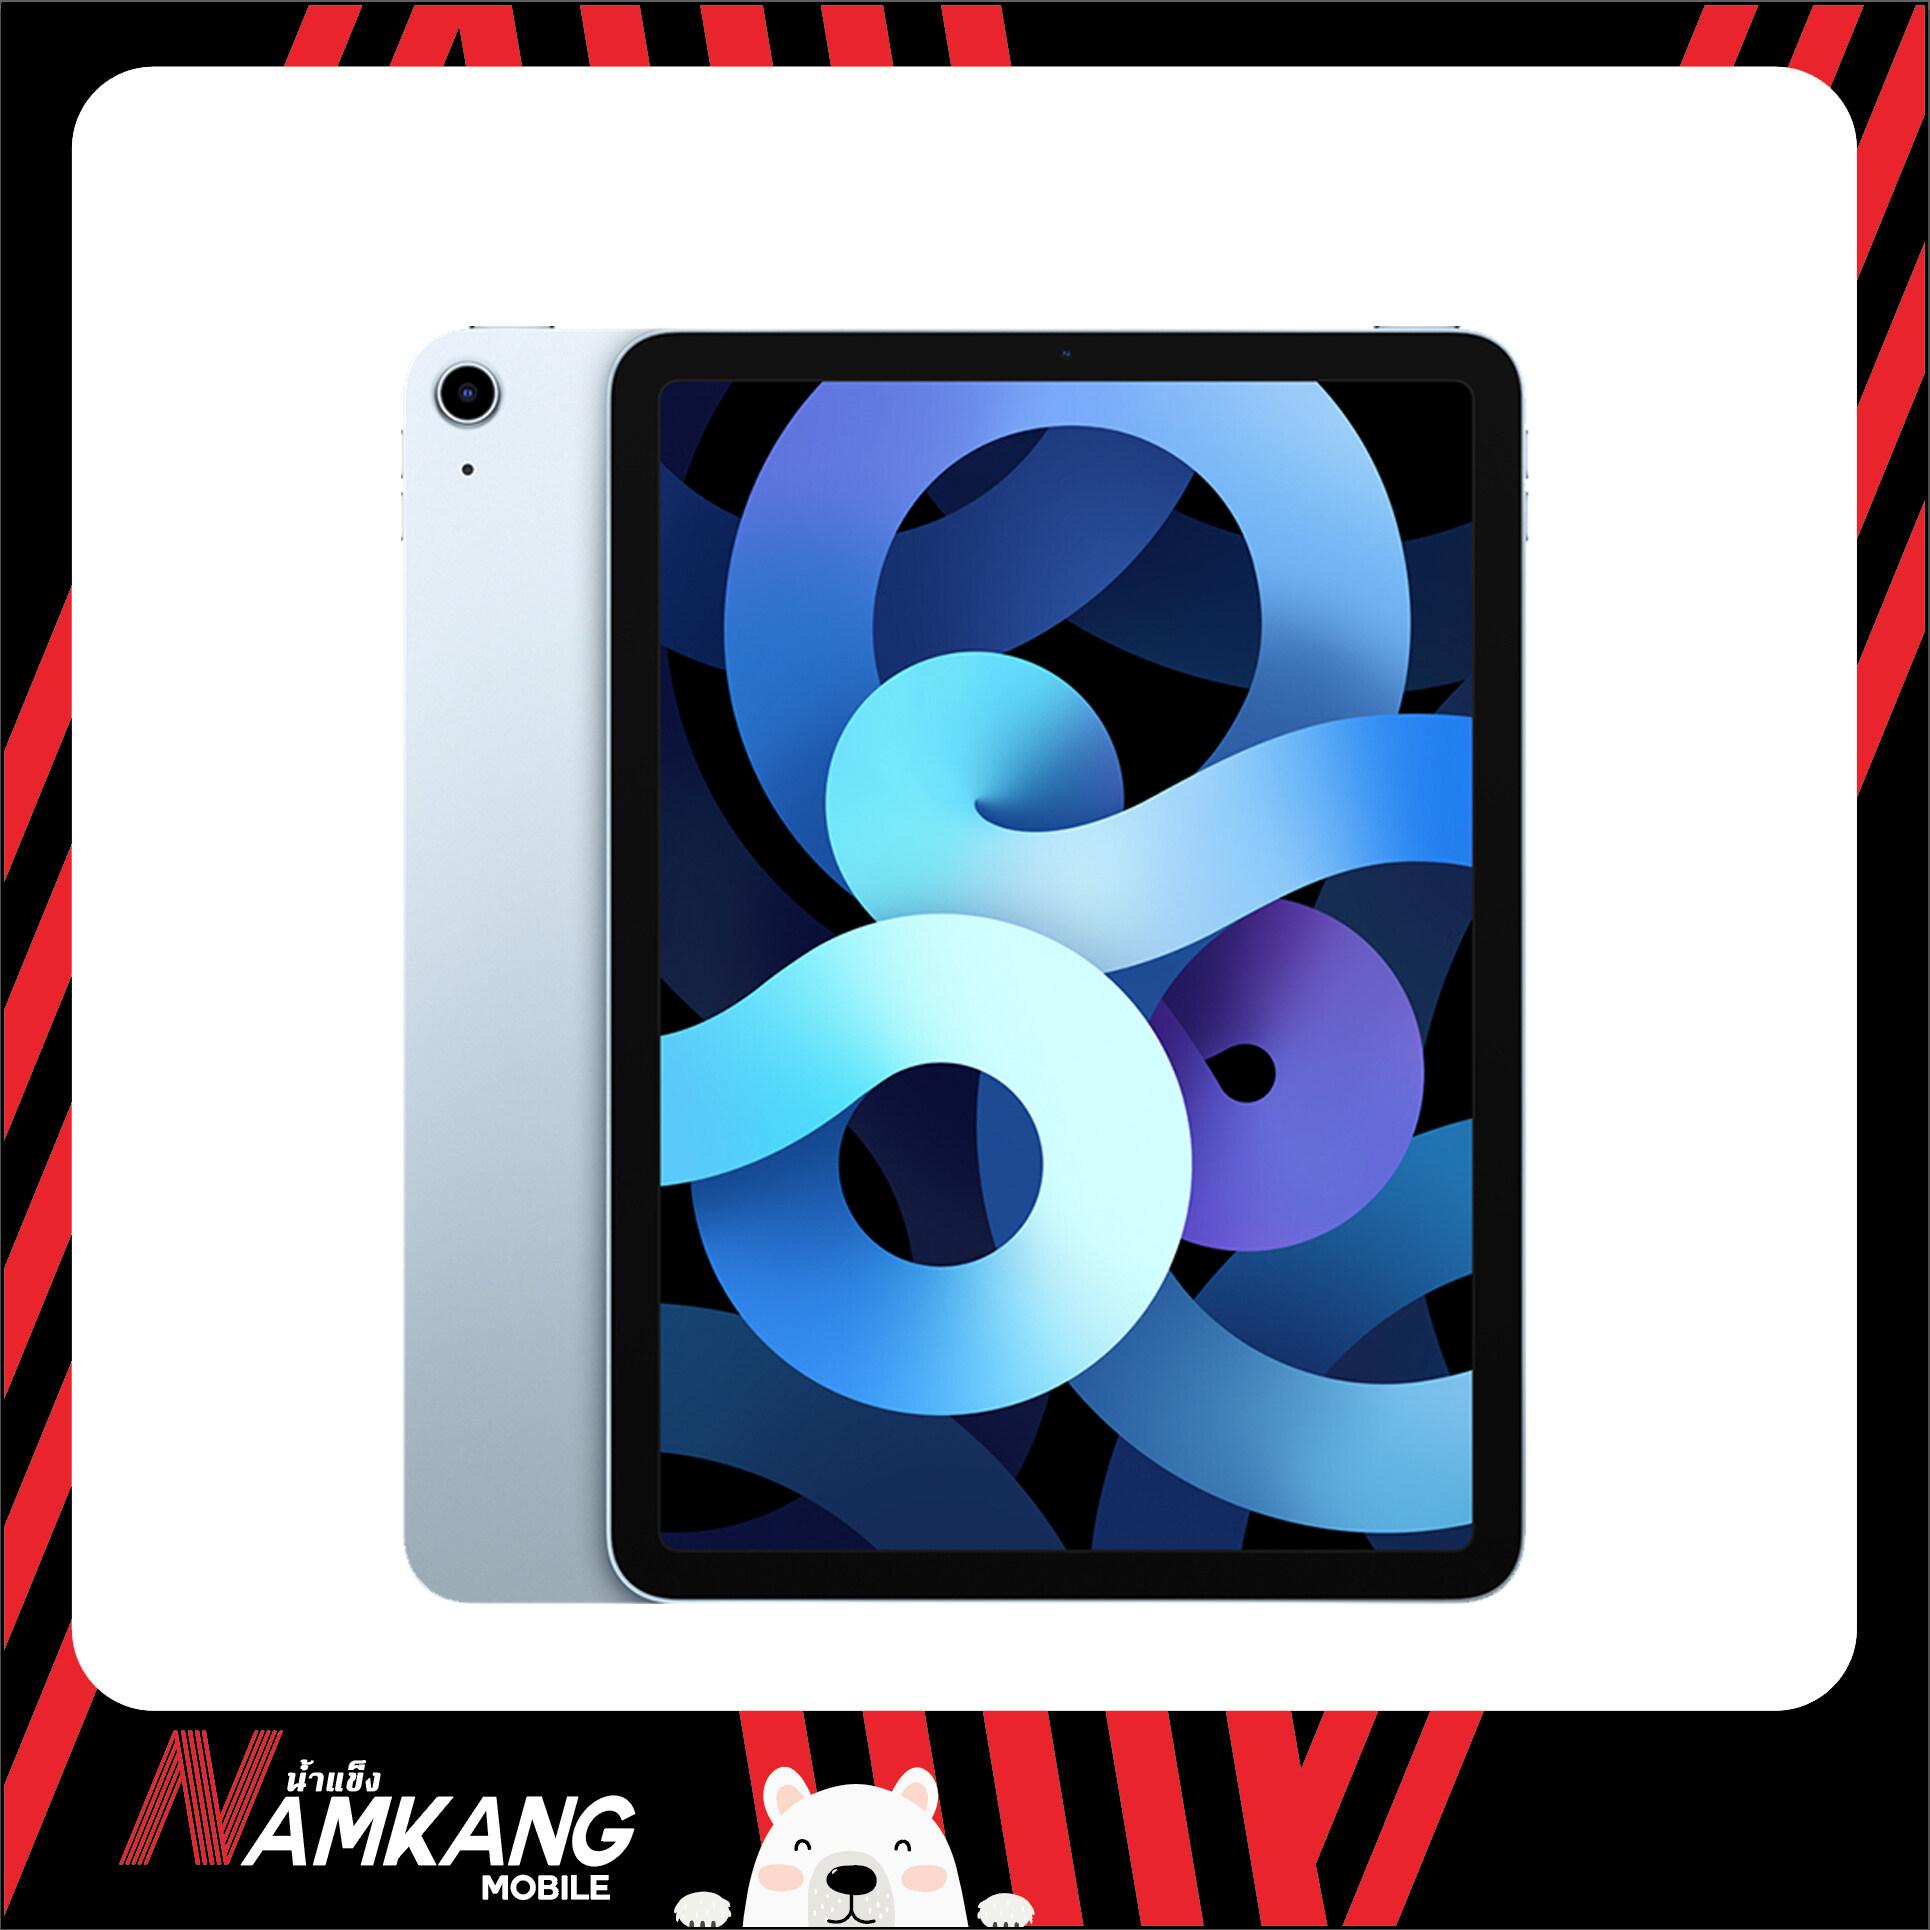 NEW iPad AIR 2020(Model TH)No Activated เครื่องศูนย์ไทย เครื่องใหม่ เครื่องแท้ รับประกันศูนย์ Apple 1 ปี/ Namkangmobile / ร้าน Namkangmobile